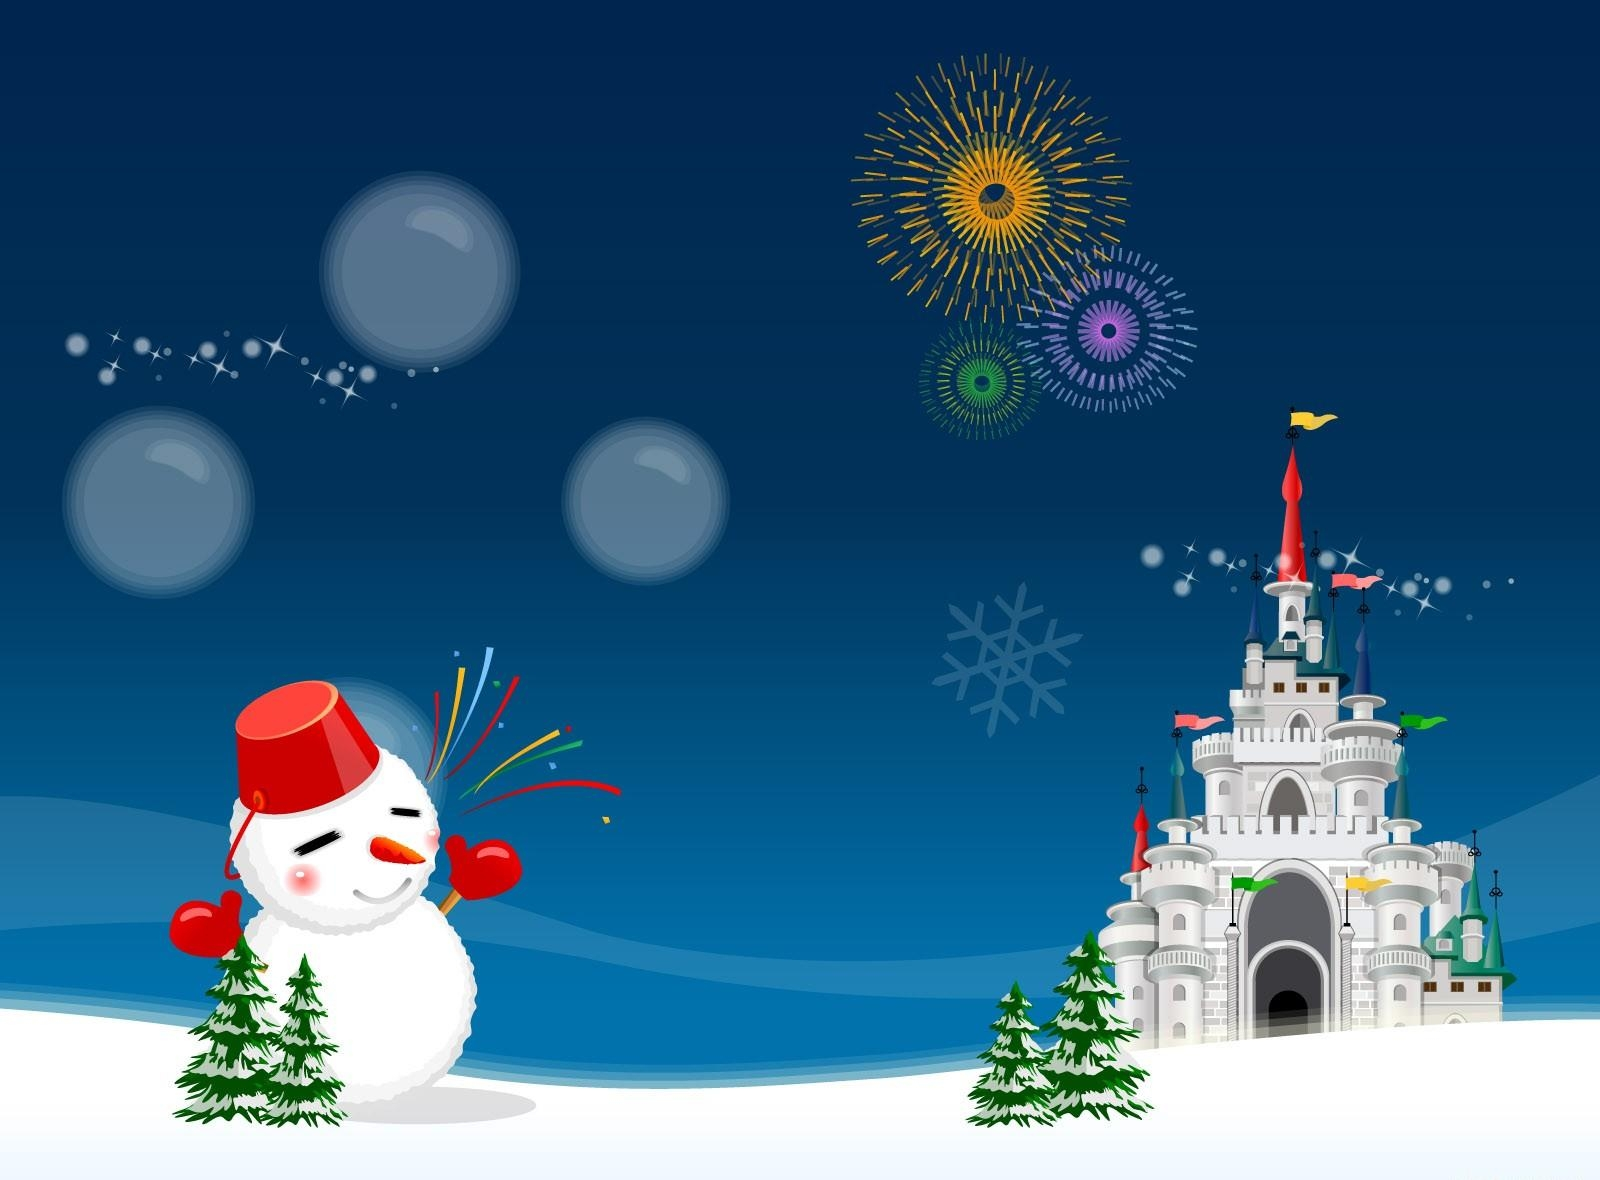 1600x1180 Wallpaper snowman, castle, fireworks, holiday, christmas trees, christmas